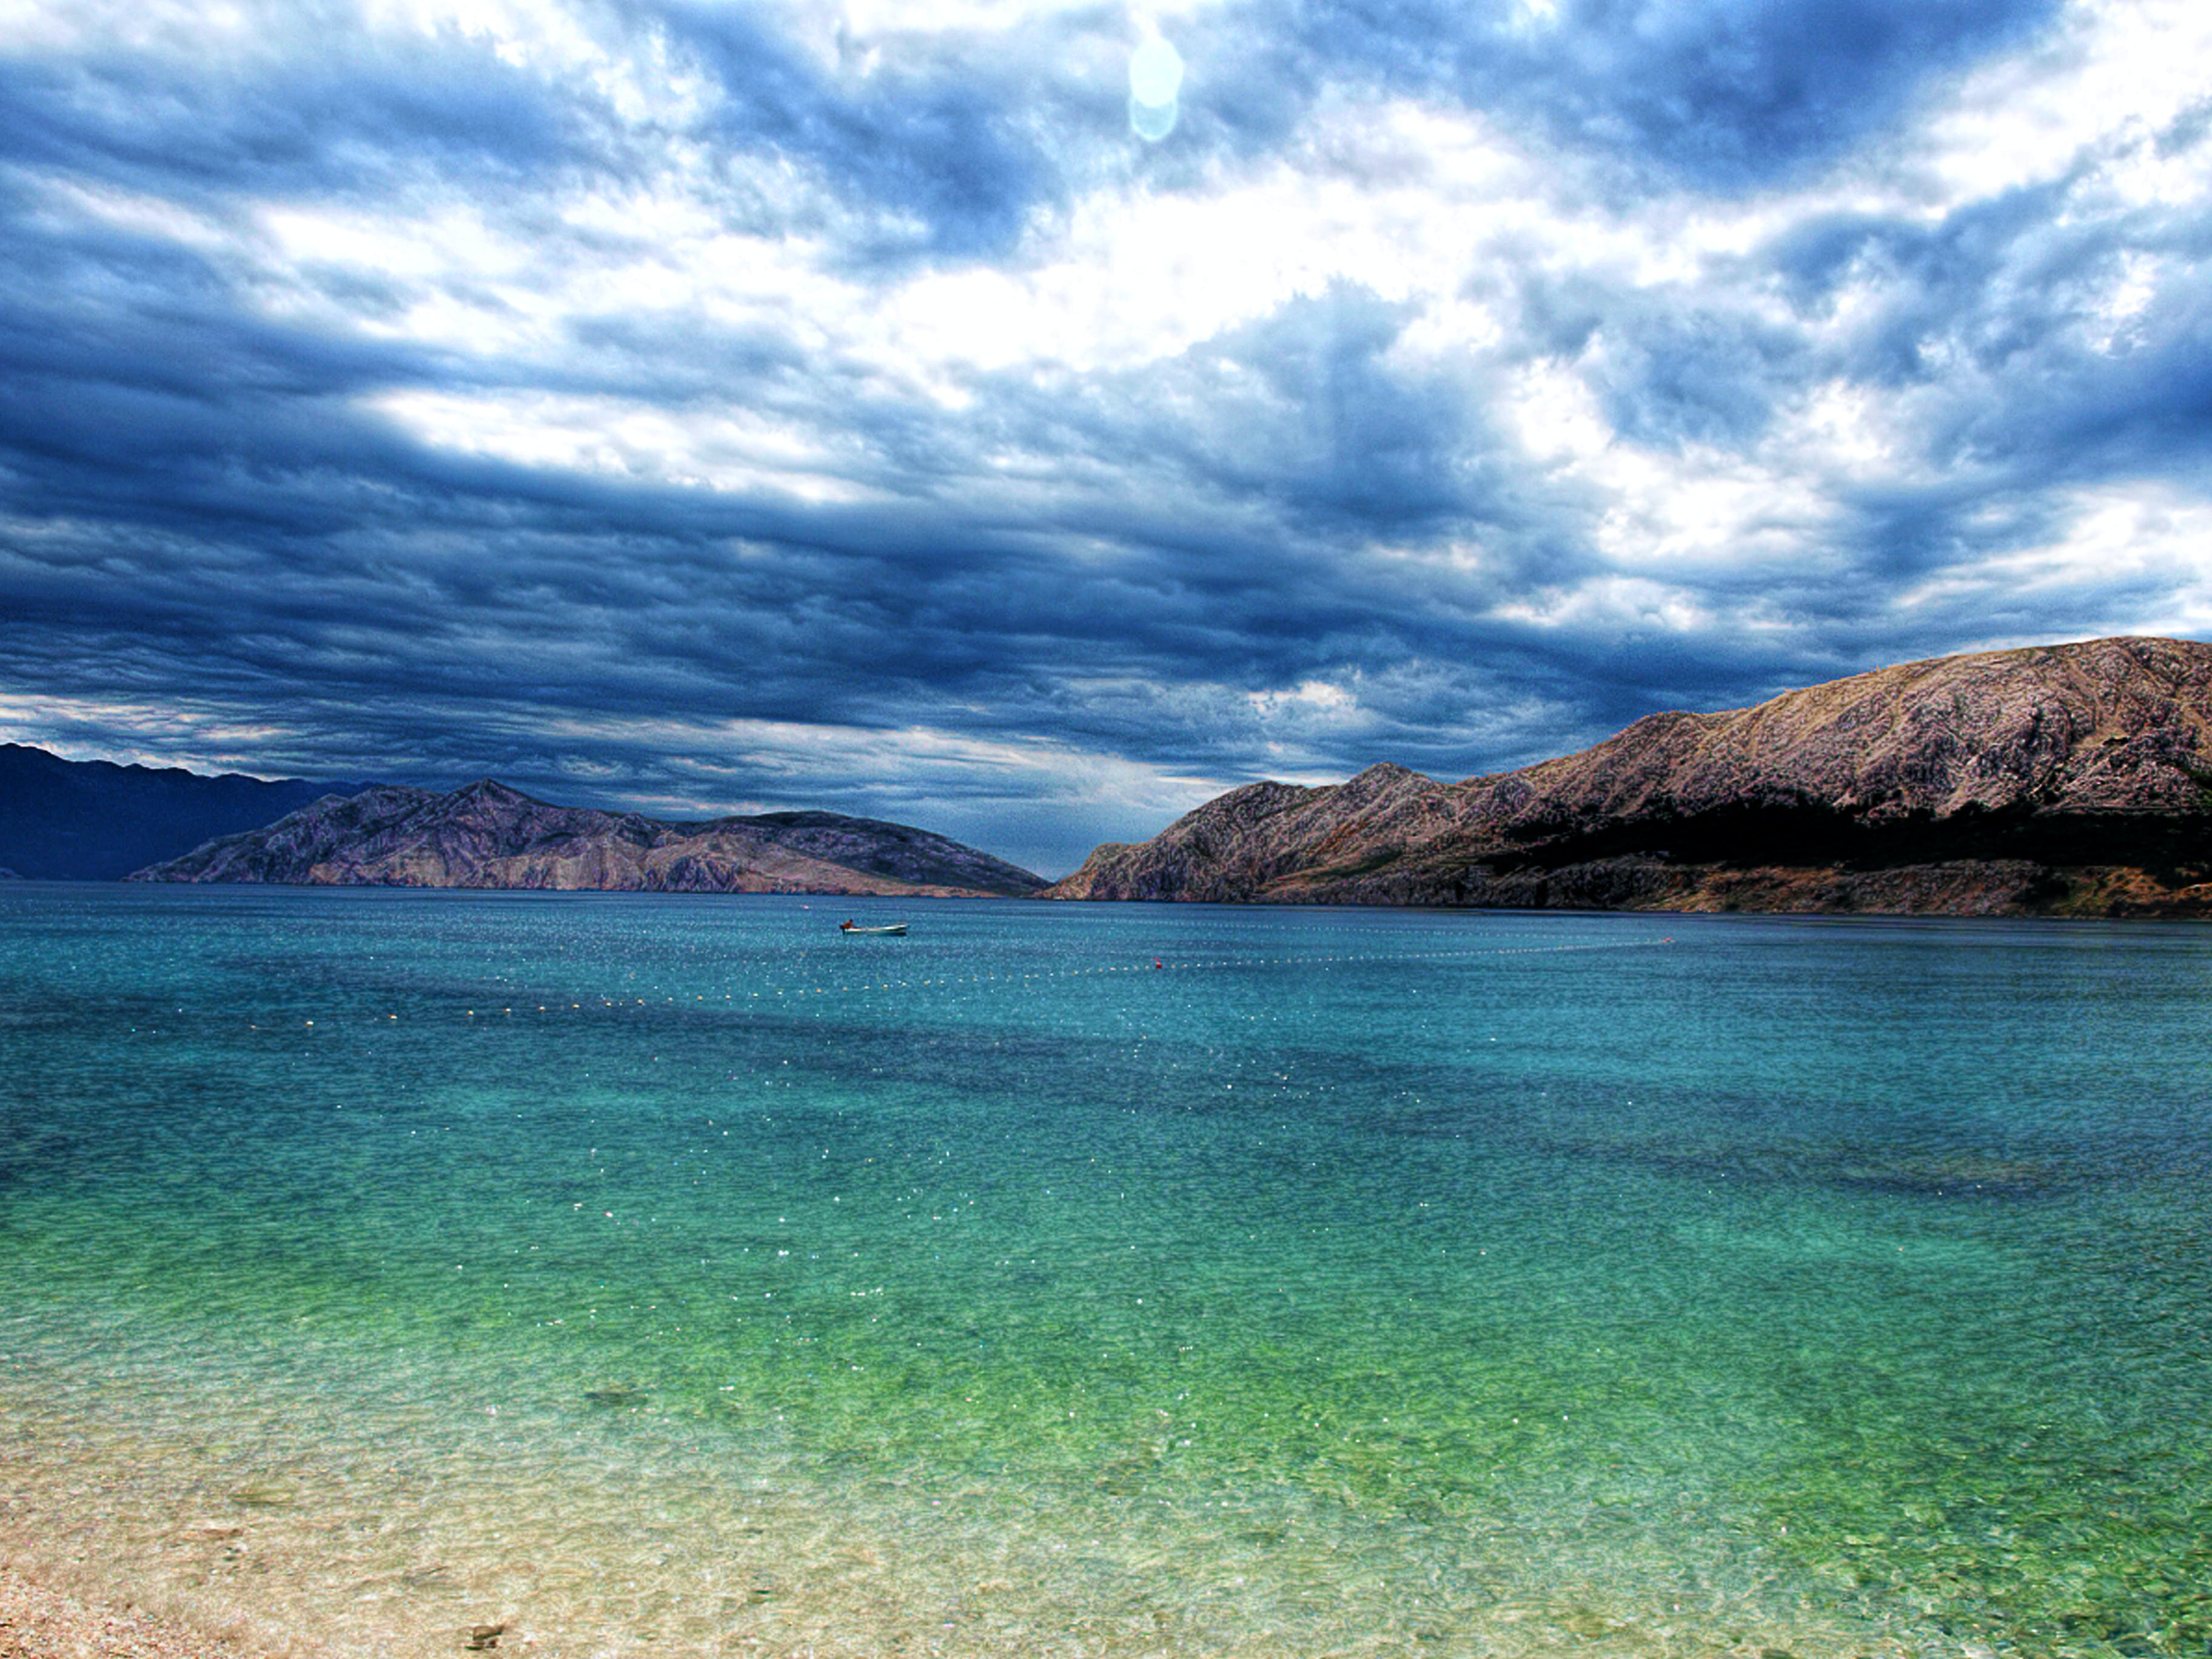 Kostenloses Stock Foto zu am meer, berge, boot, bucht